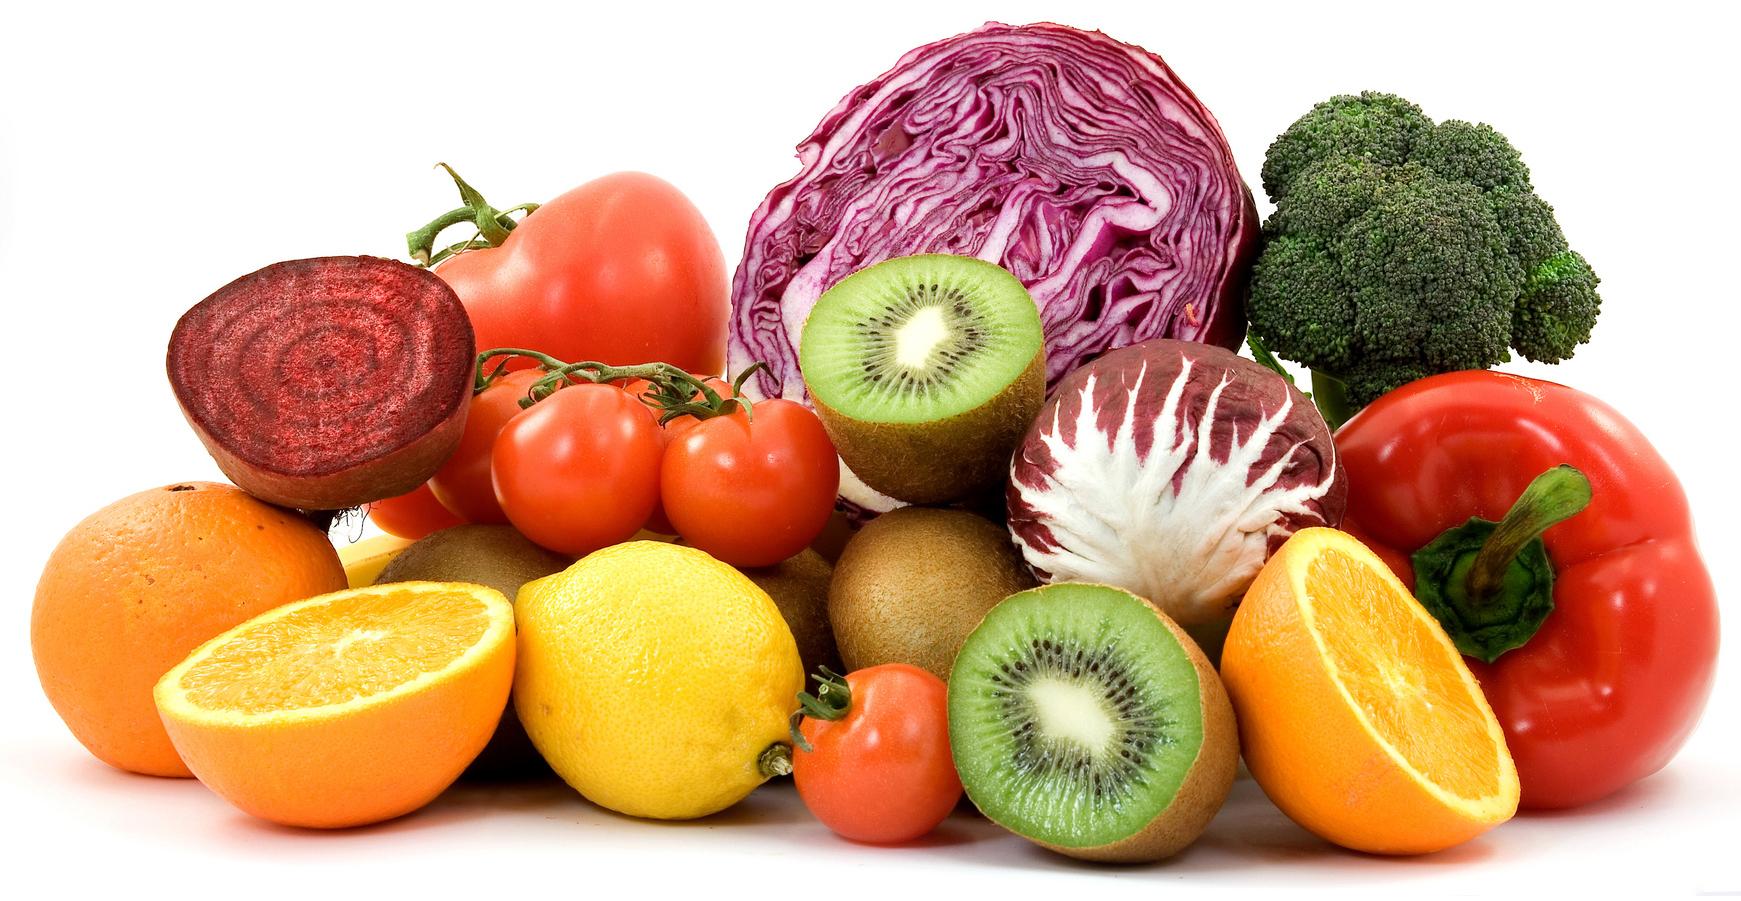 Fruta o verdura saludables dietas deportivas - Que alimentos son antioxidantes naturales ...